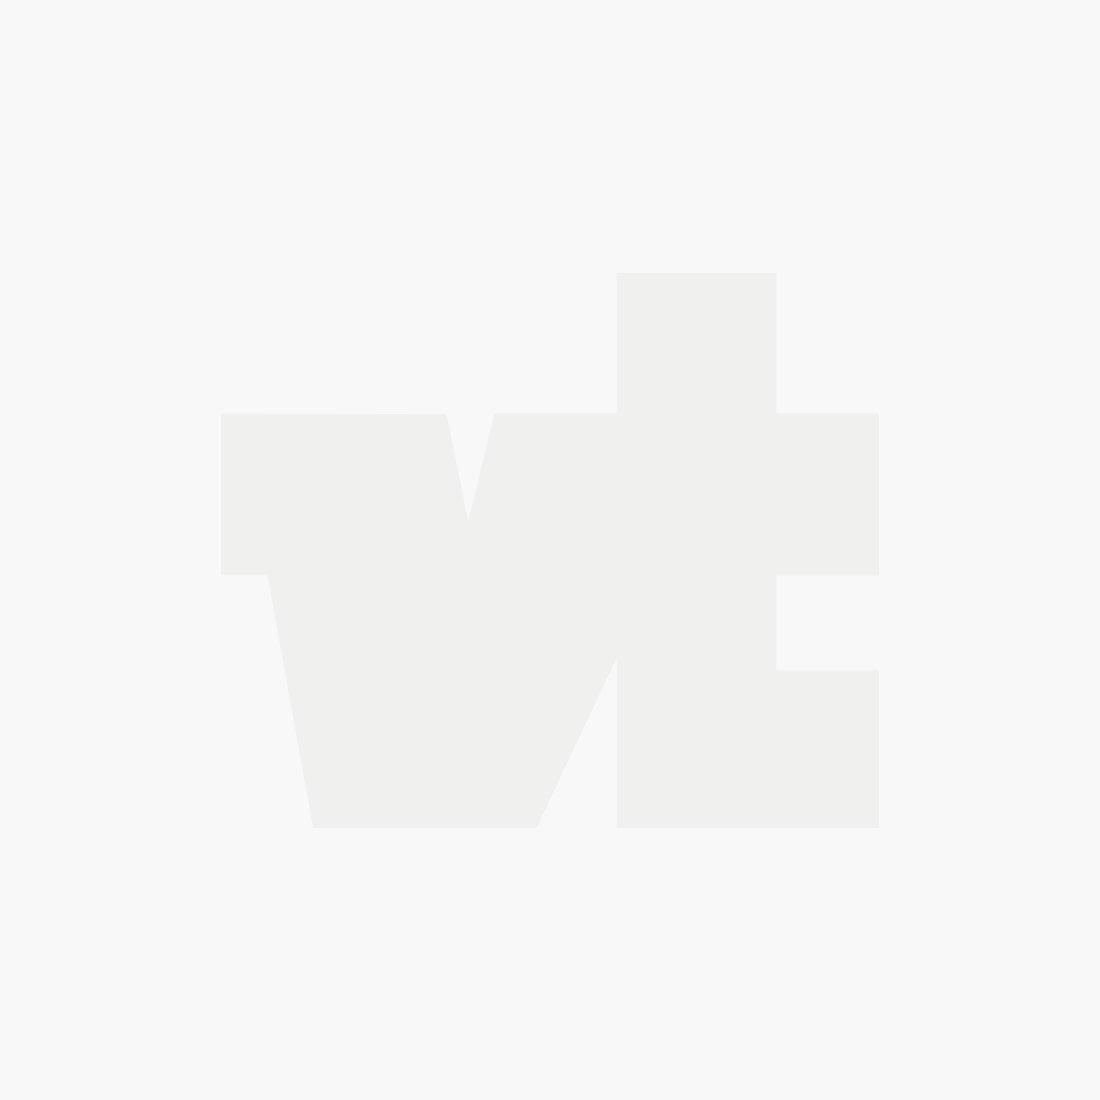 Pme fragrance d.brown